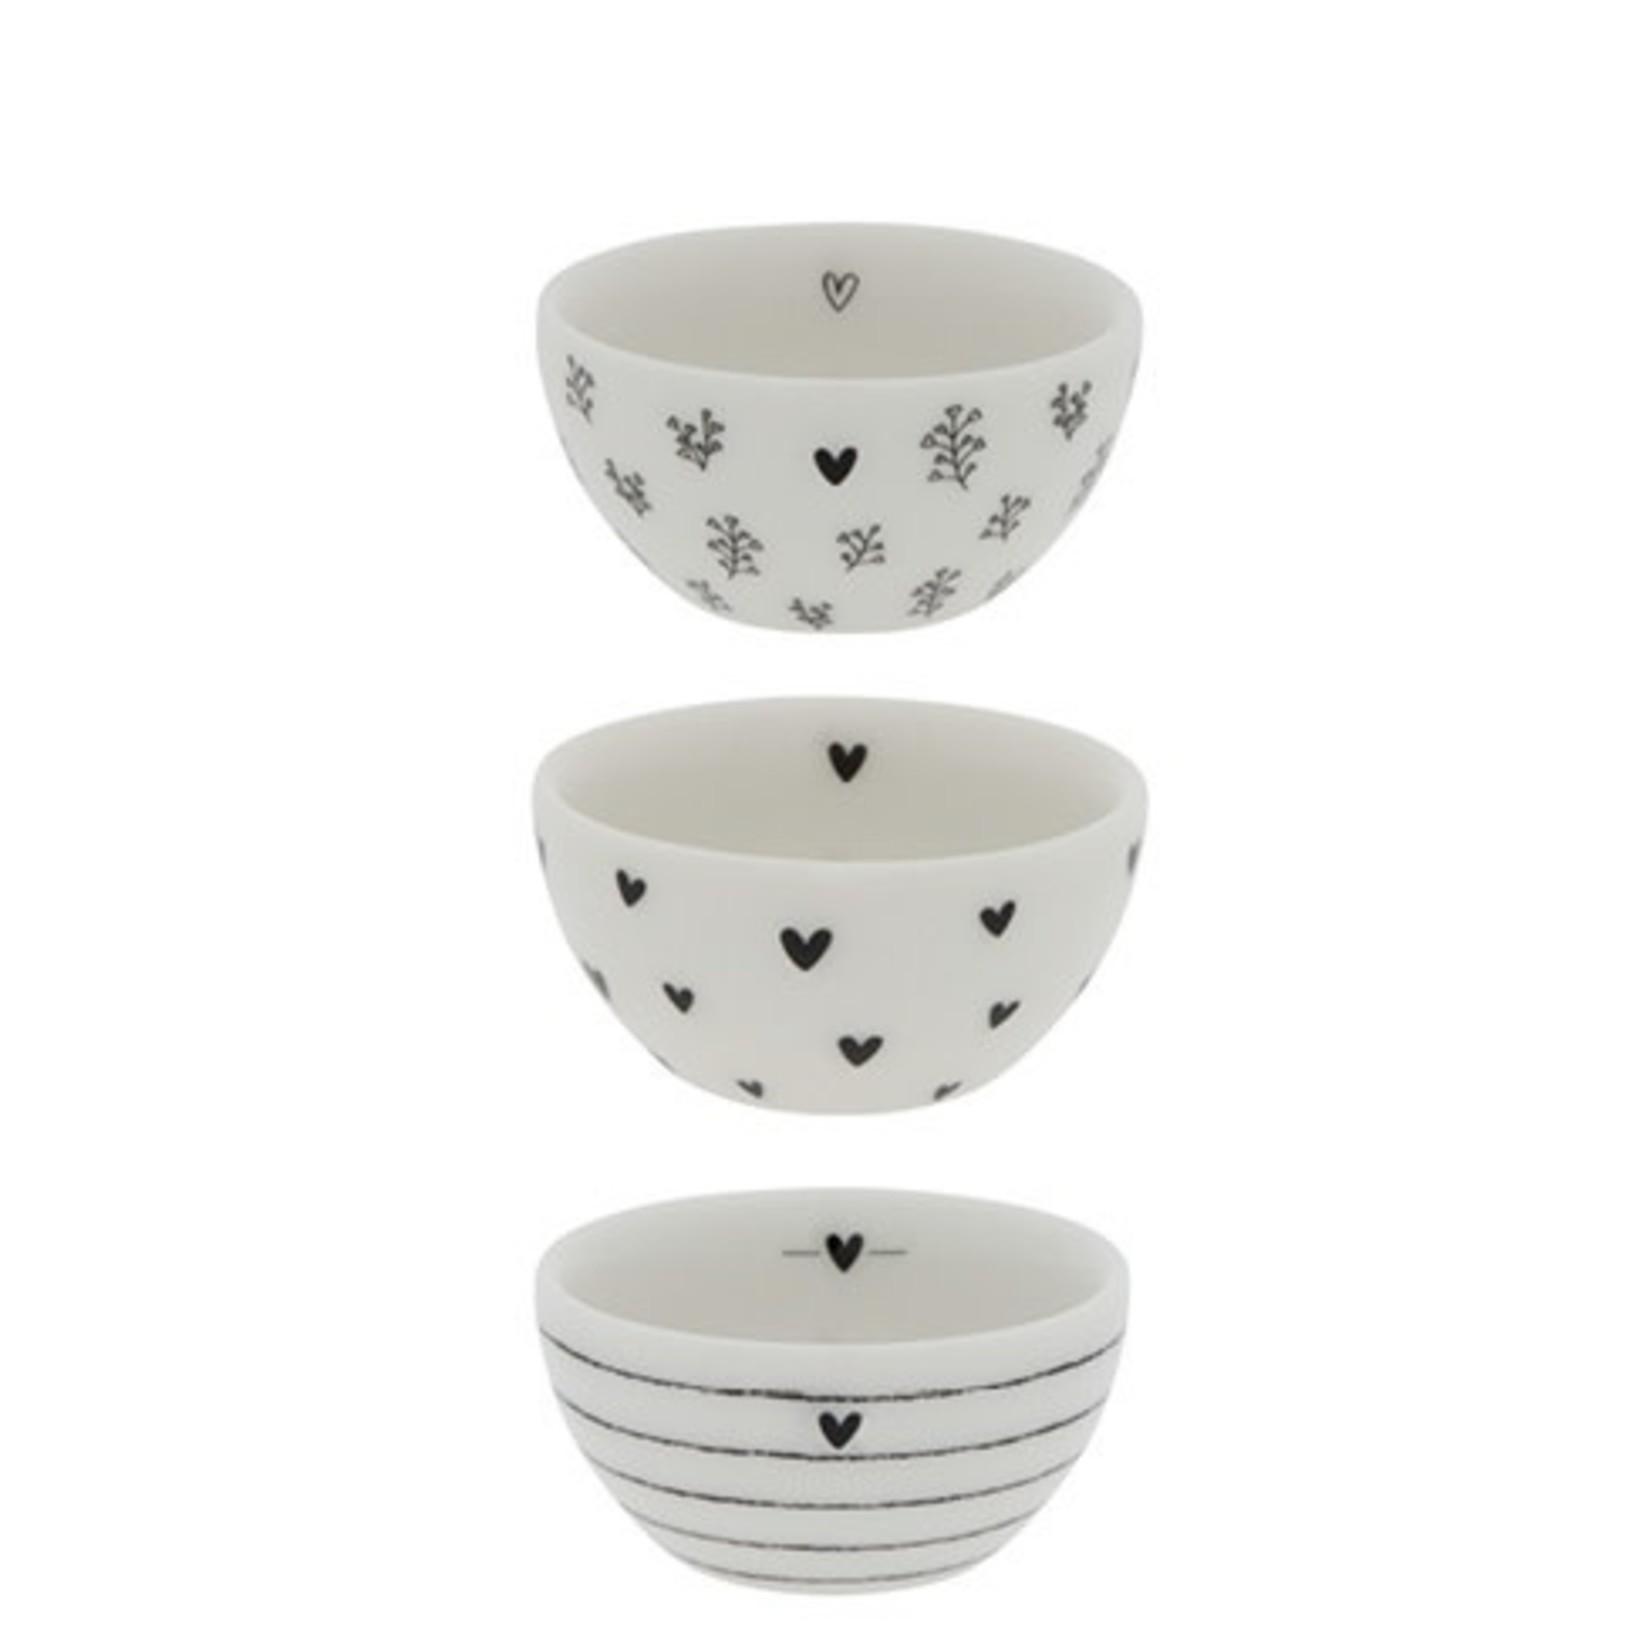 Bastion Collections Bowl XS Hearts white black 6x3 cm (2e van 3)